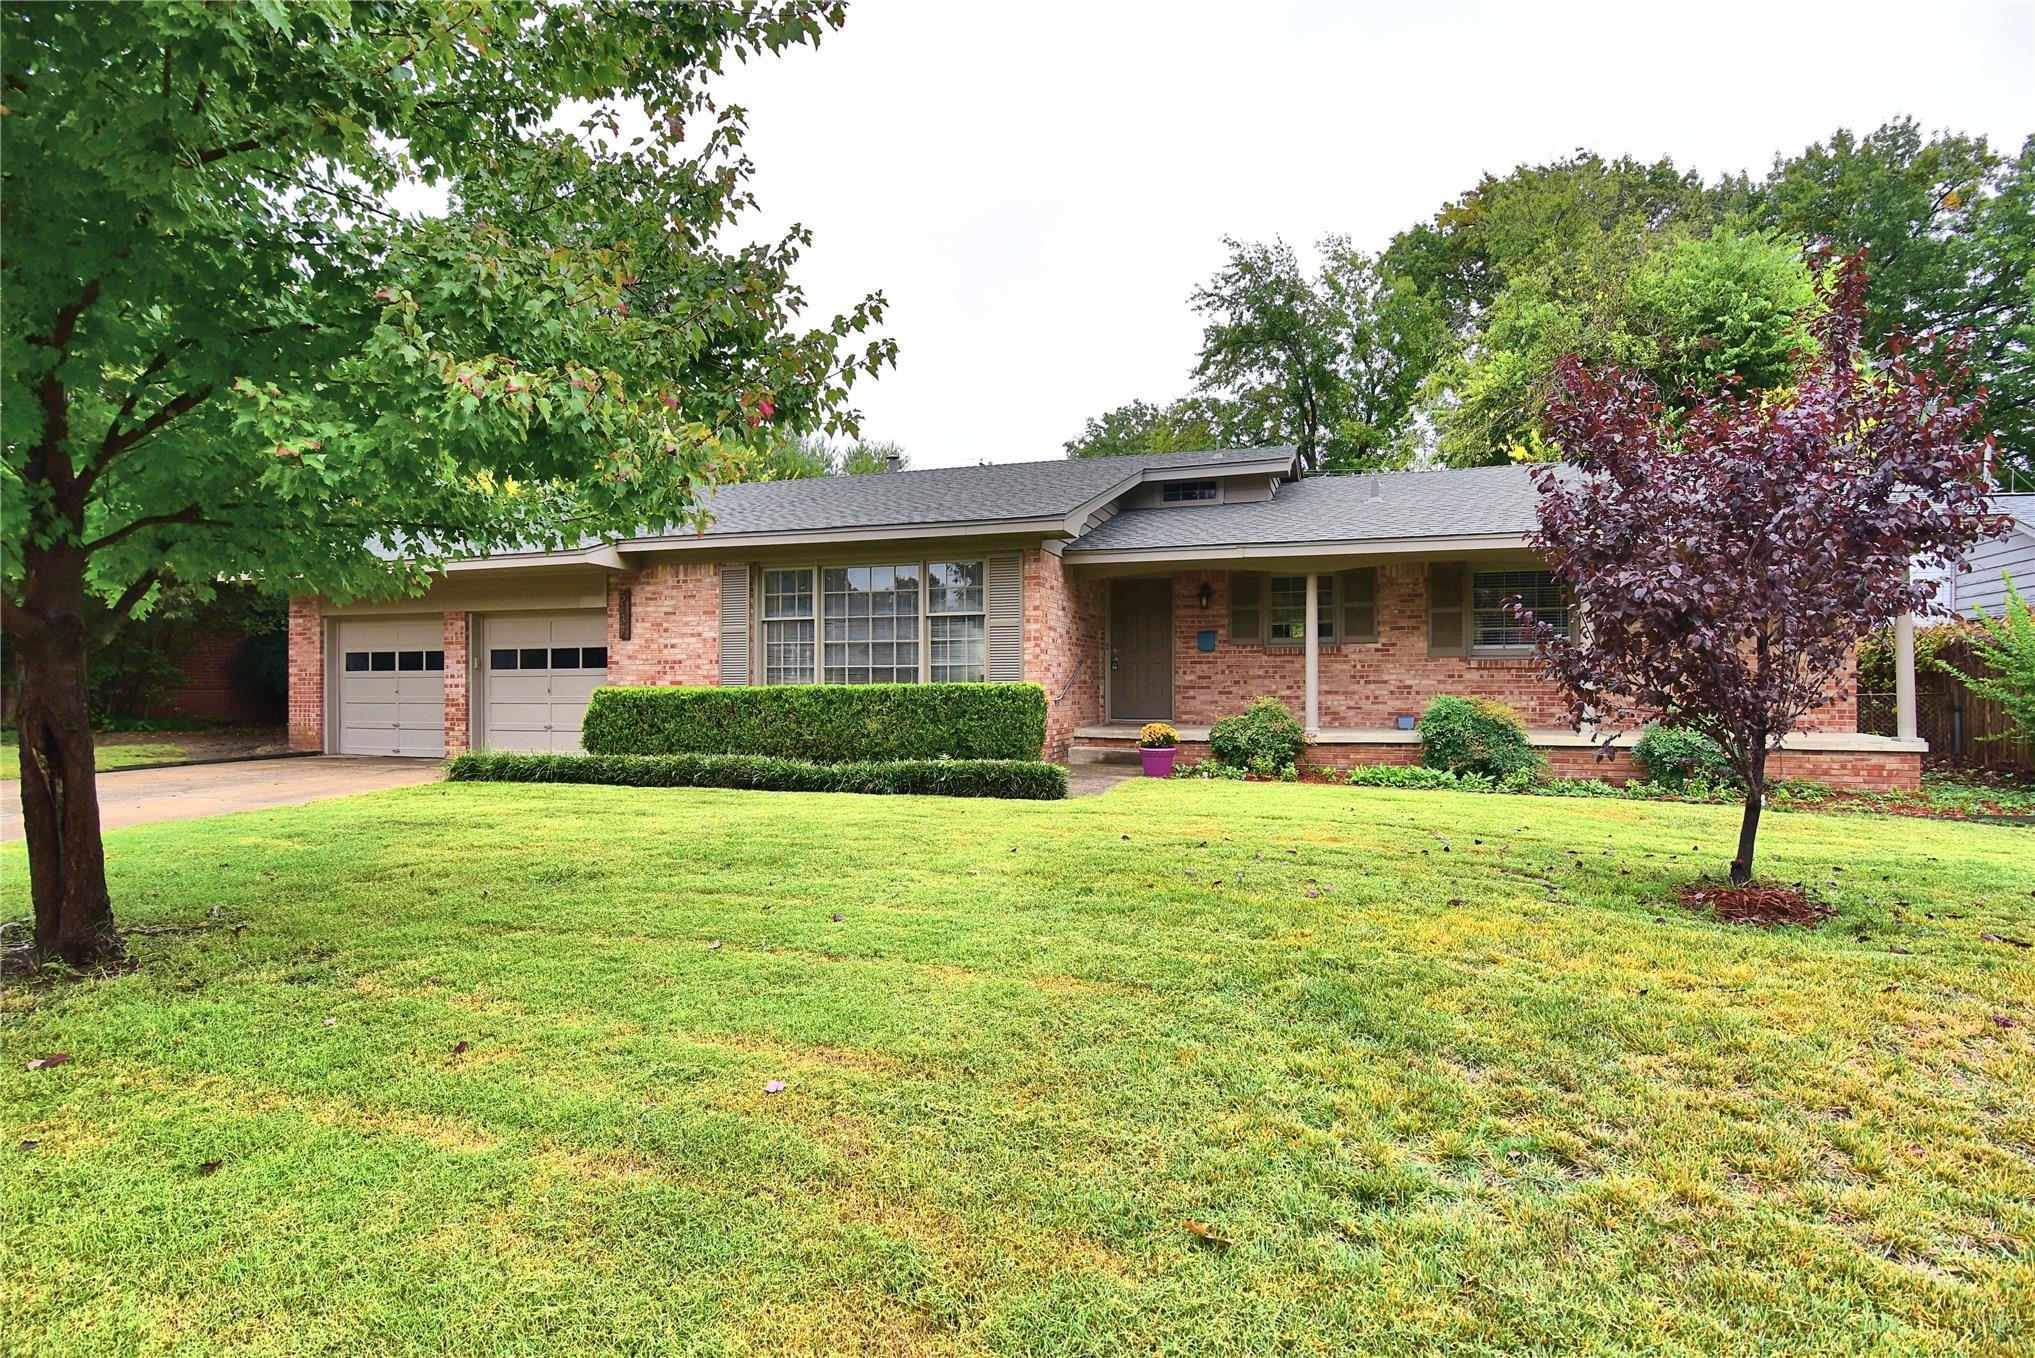 5137 S Richmond Avenue Tulsa, OK - $209,500